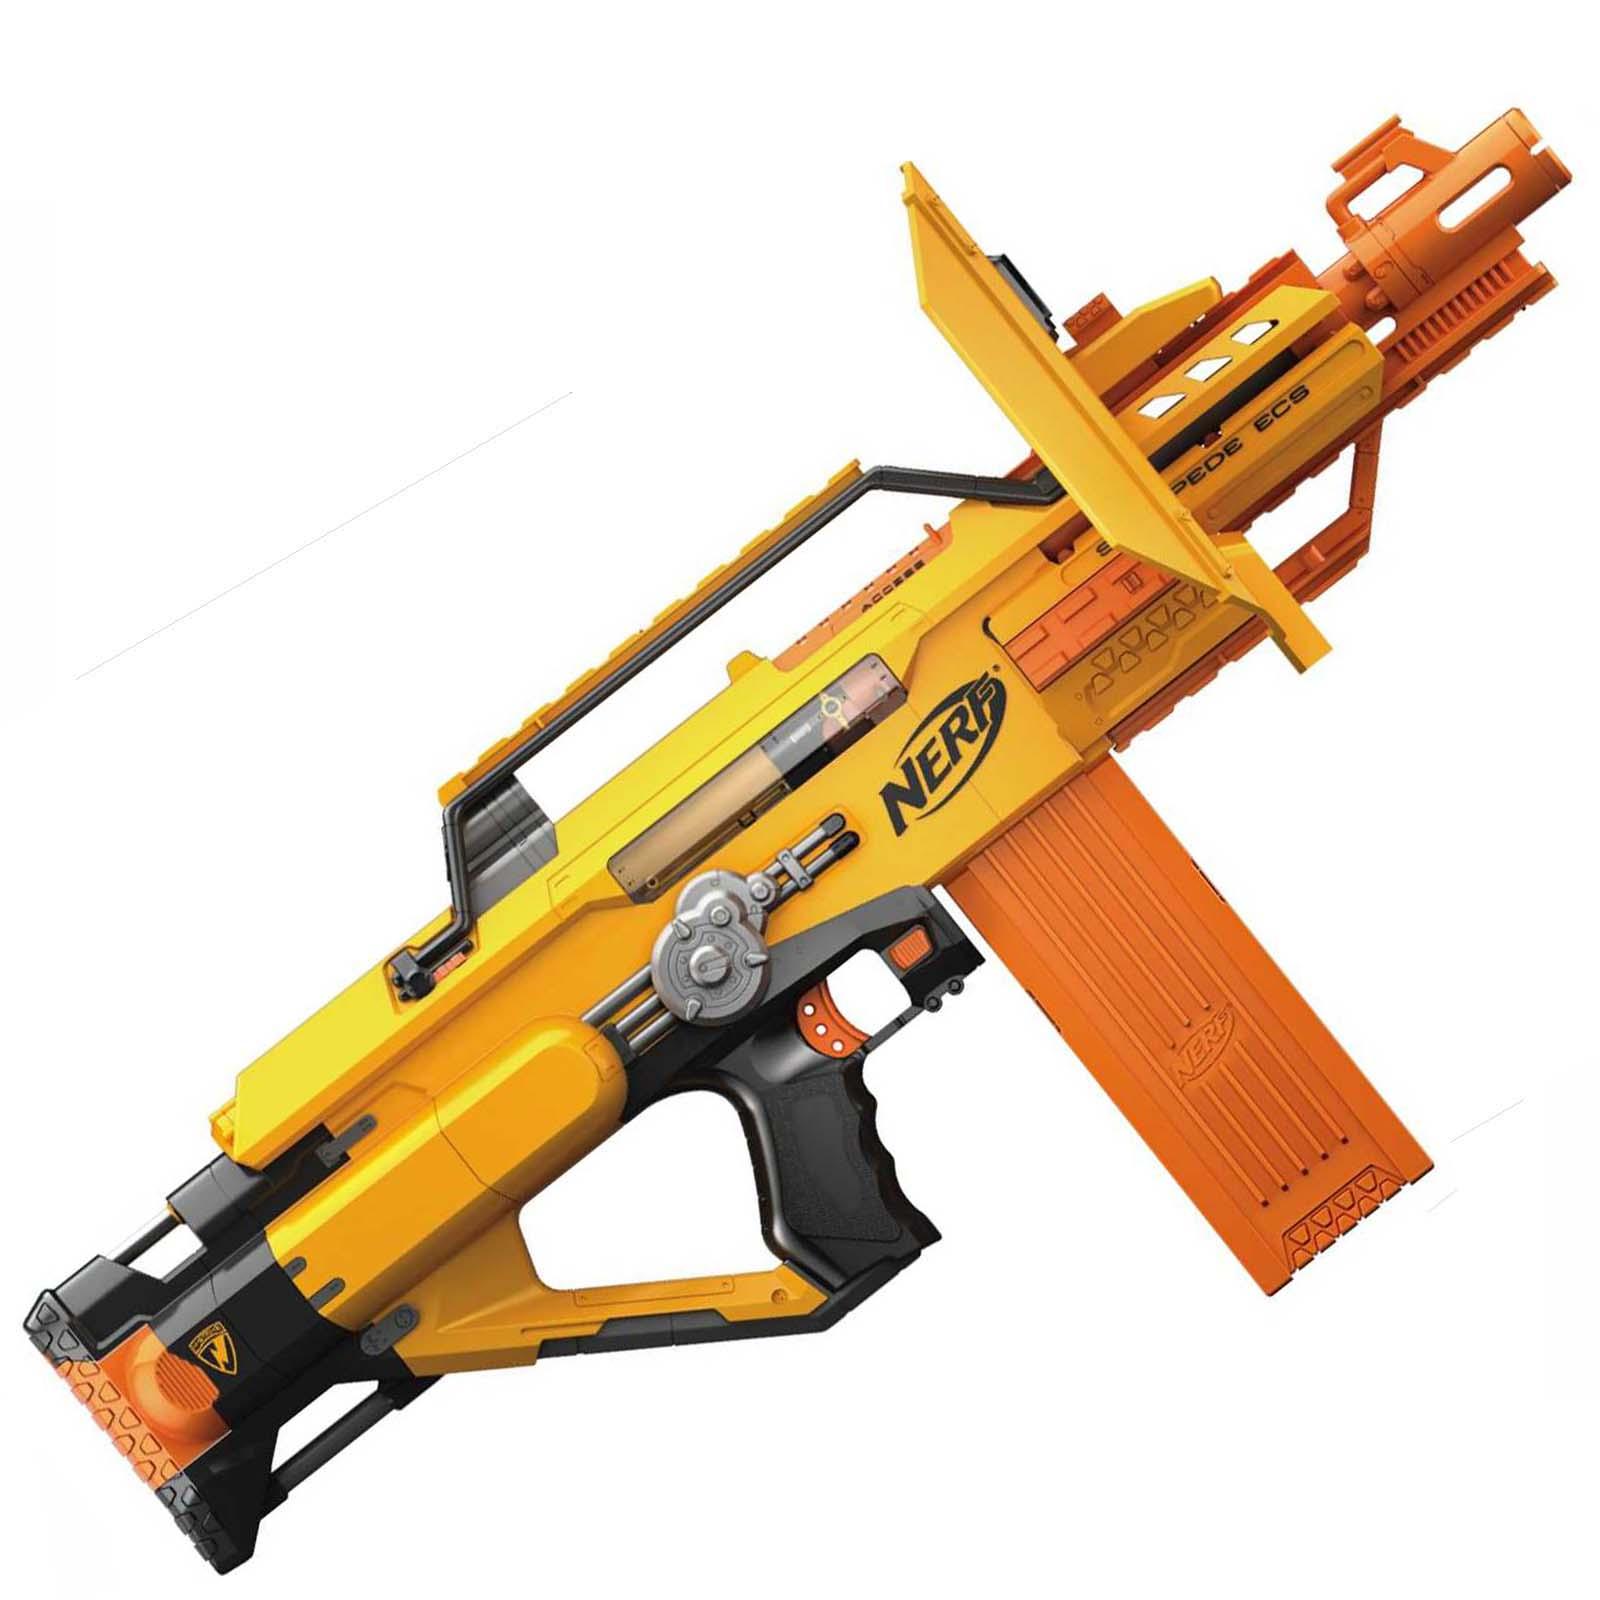 Stampede Ecs 50 N Strike Automatic Nerf Rifle Nerf Gun